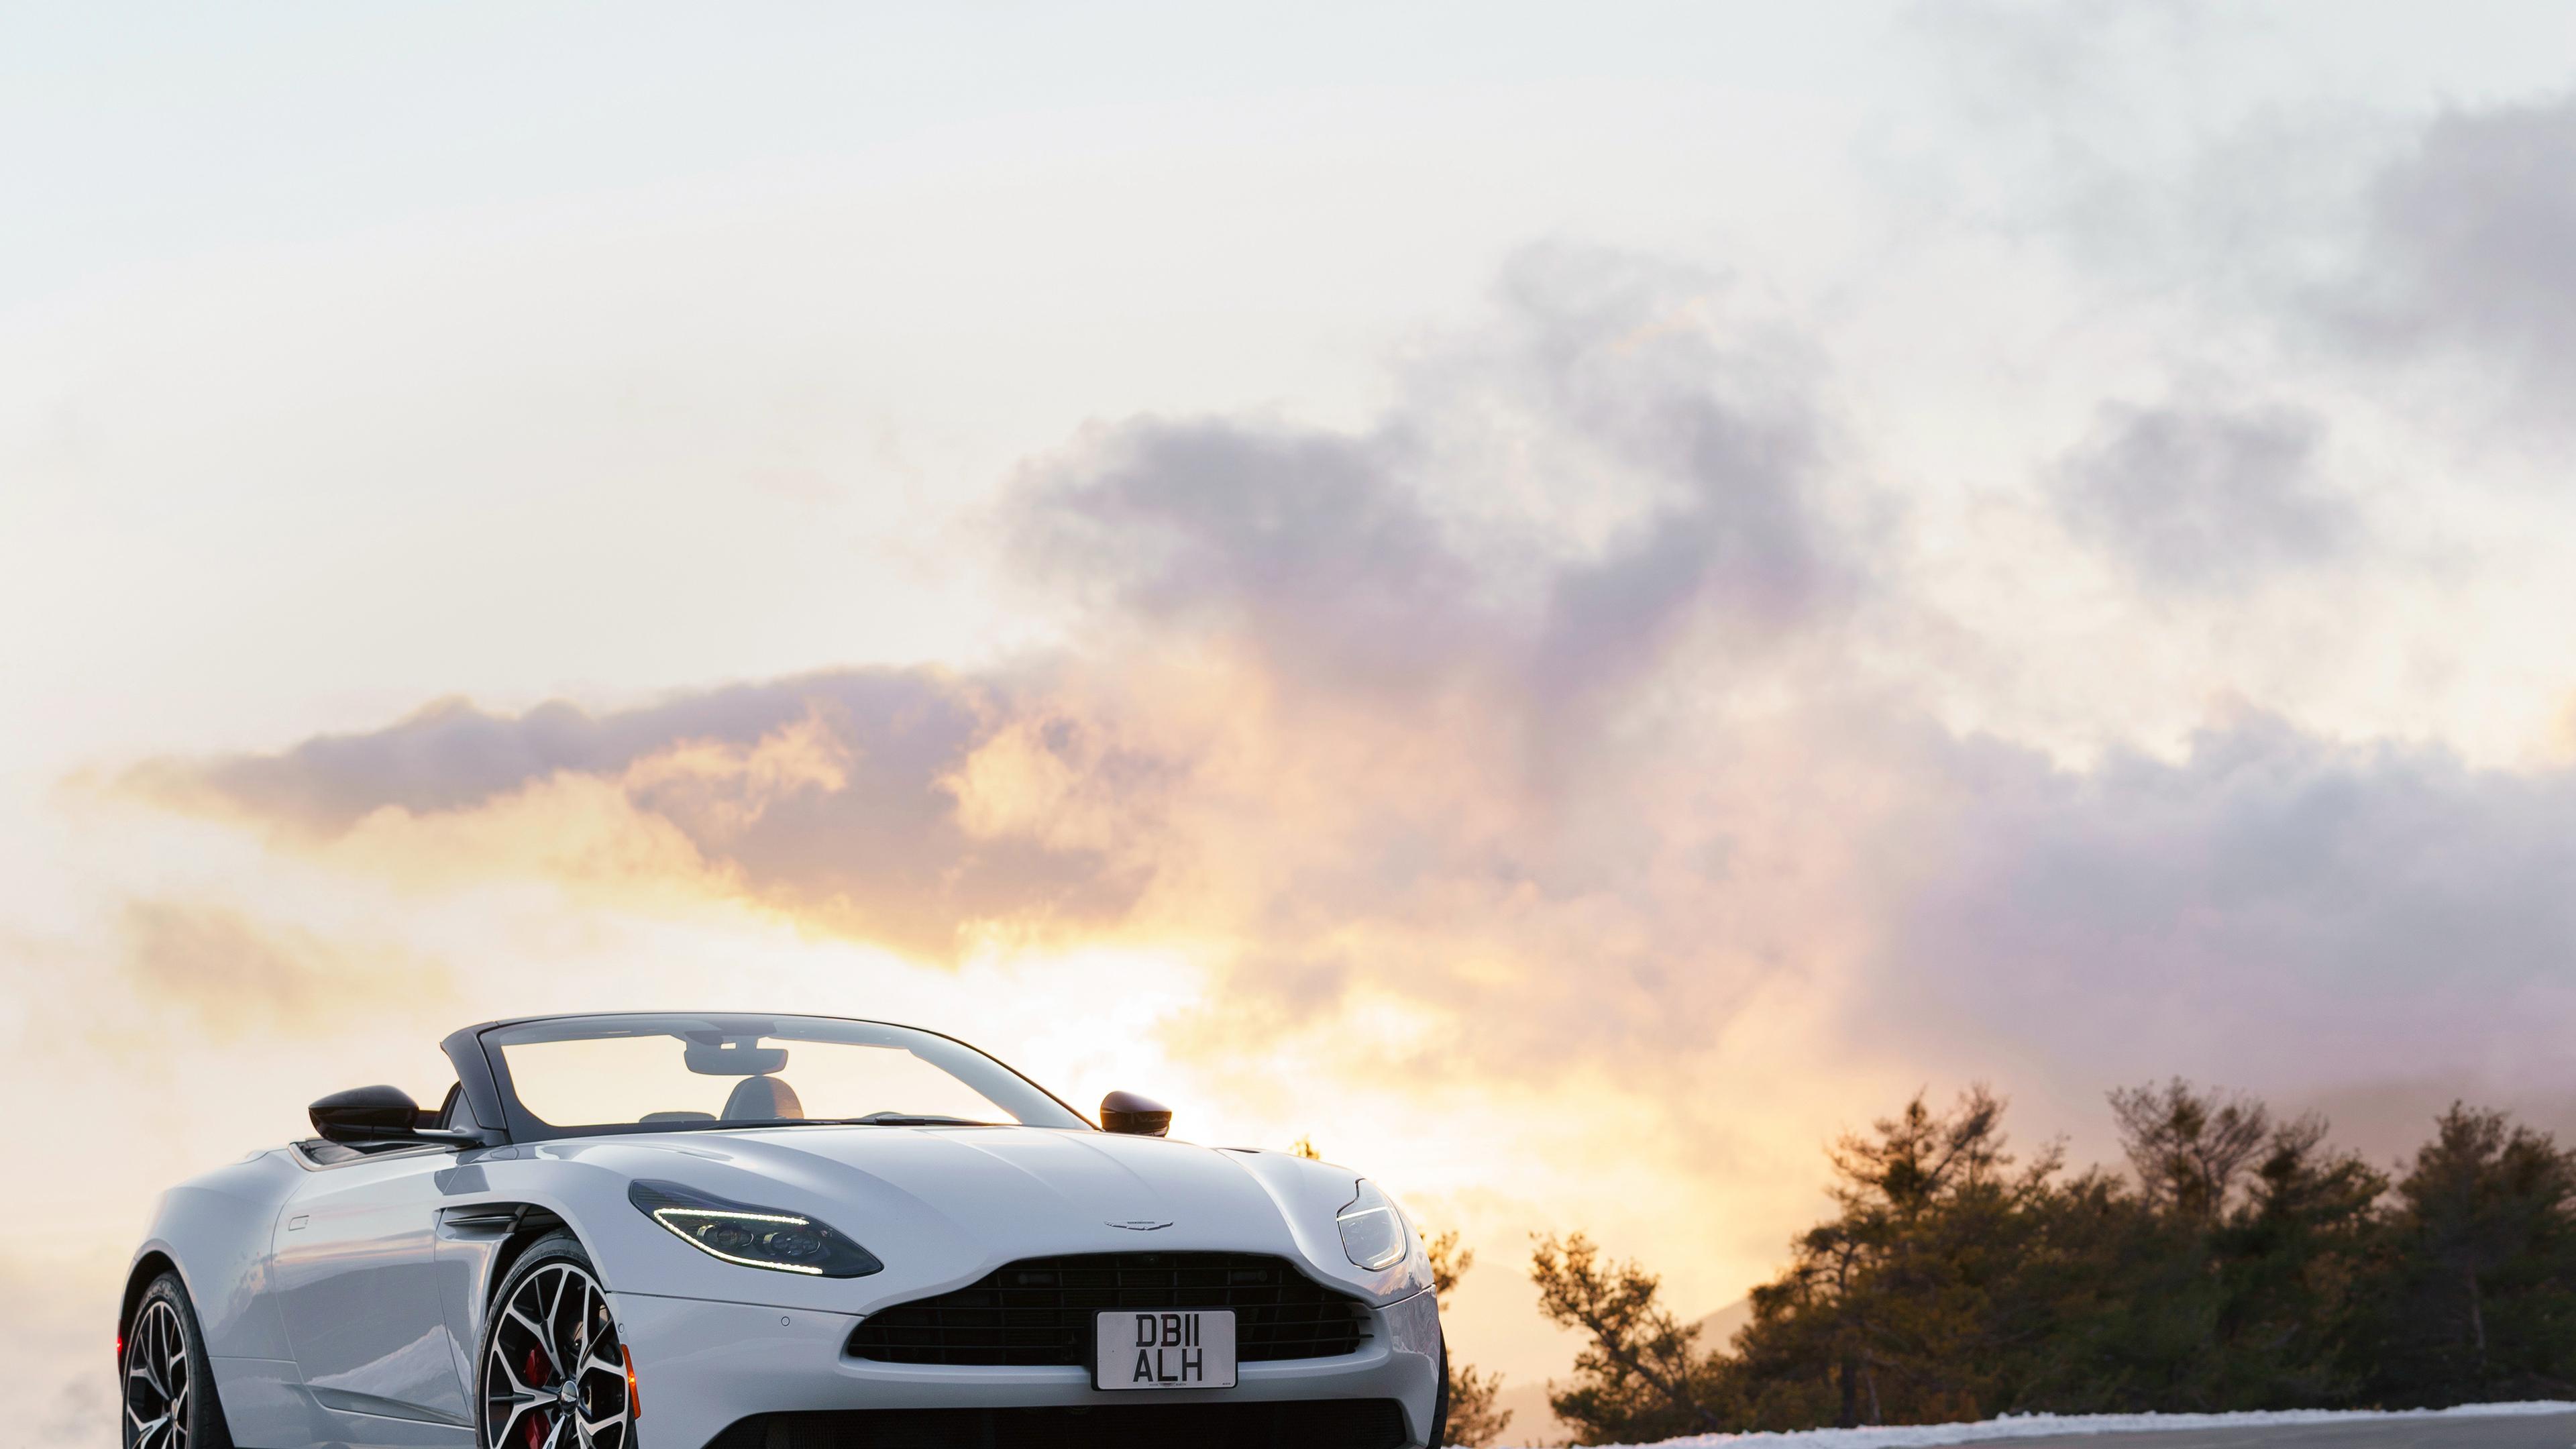 2019 aston martin db11 v8 4k 1539111473 - 2019 Aston Martin DB11 V8 4k - hd-wallpapers, cars wallpapers, aston martin wallpapers, aston martin db11 wallpapers, 4k-wallpapers, 2019 cars wallpapers